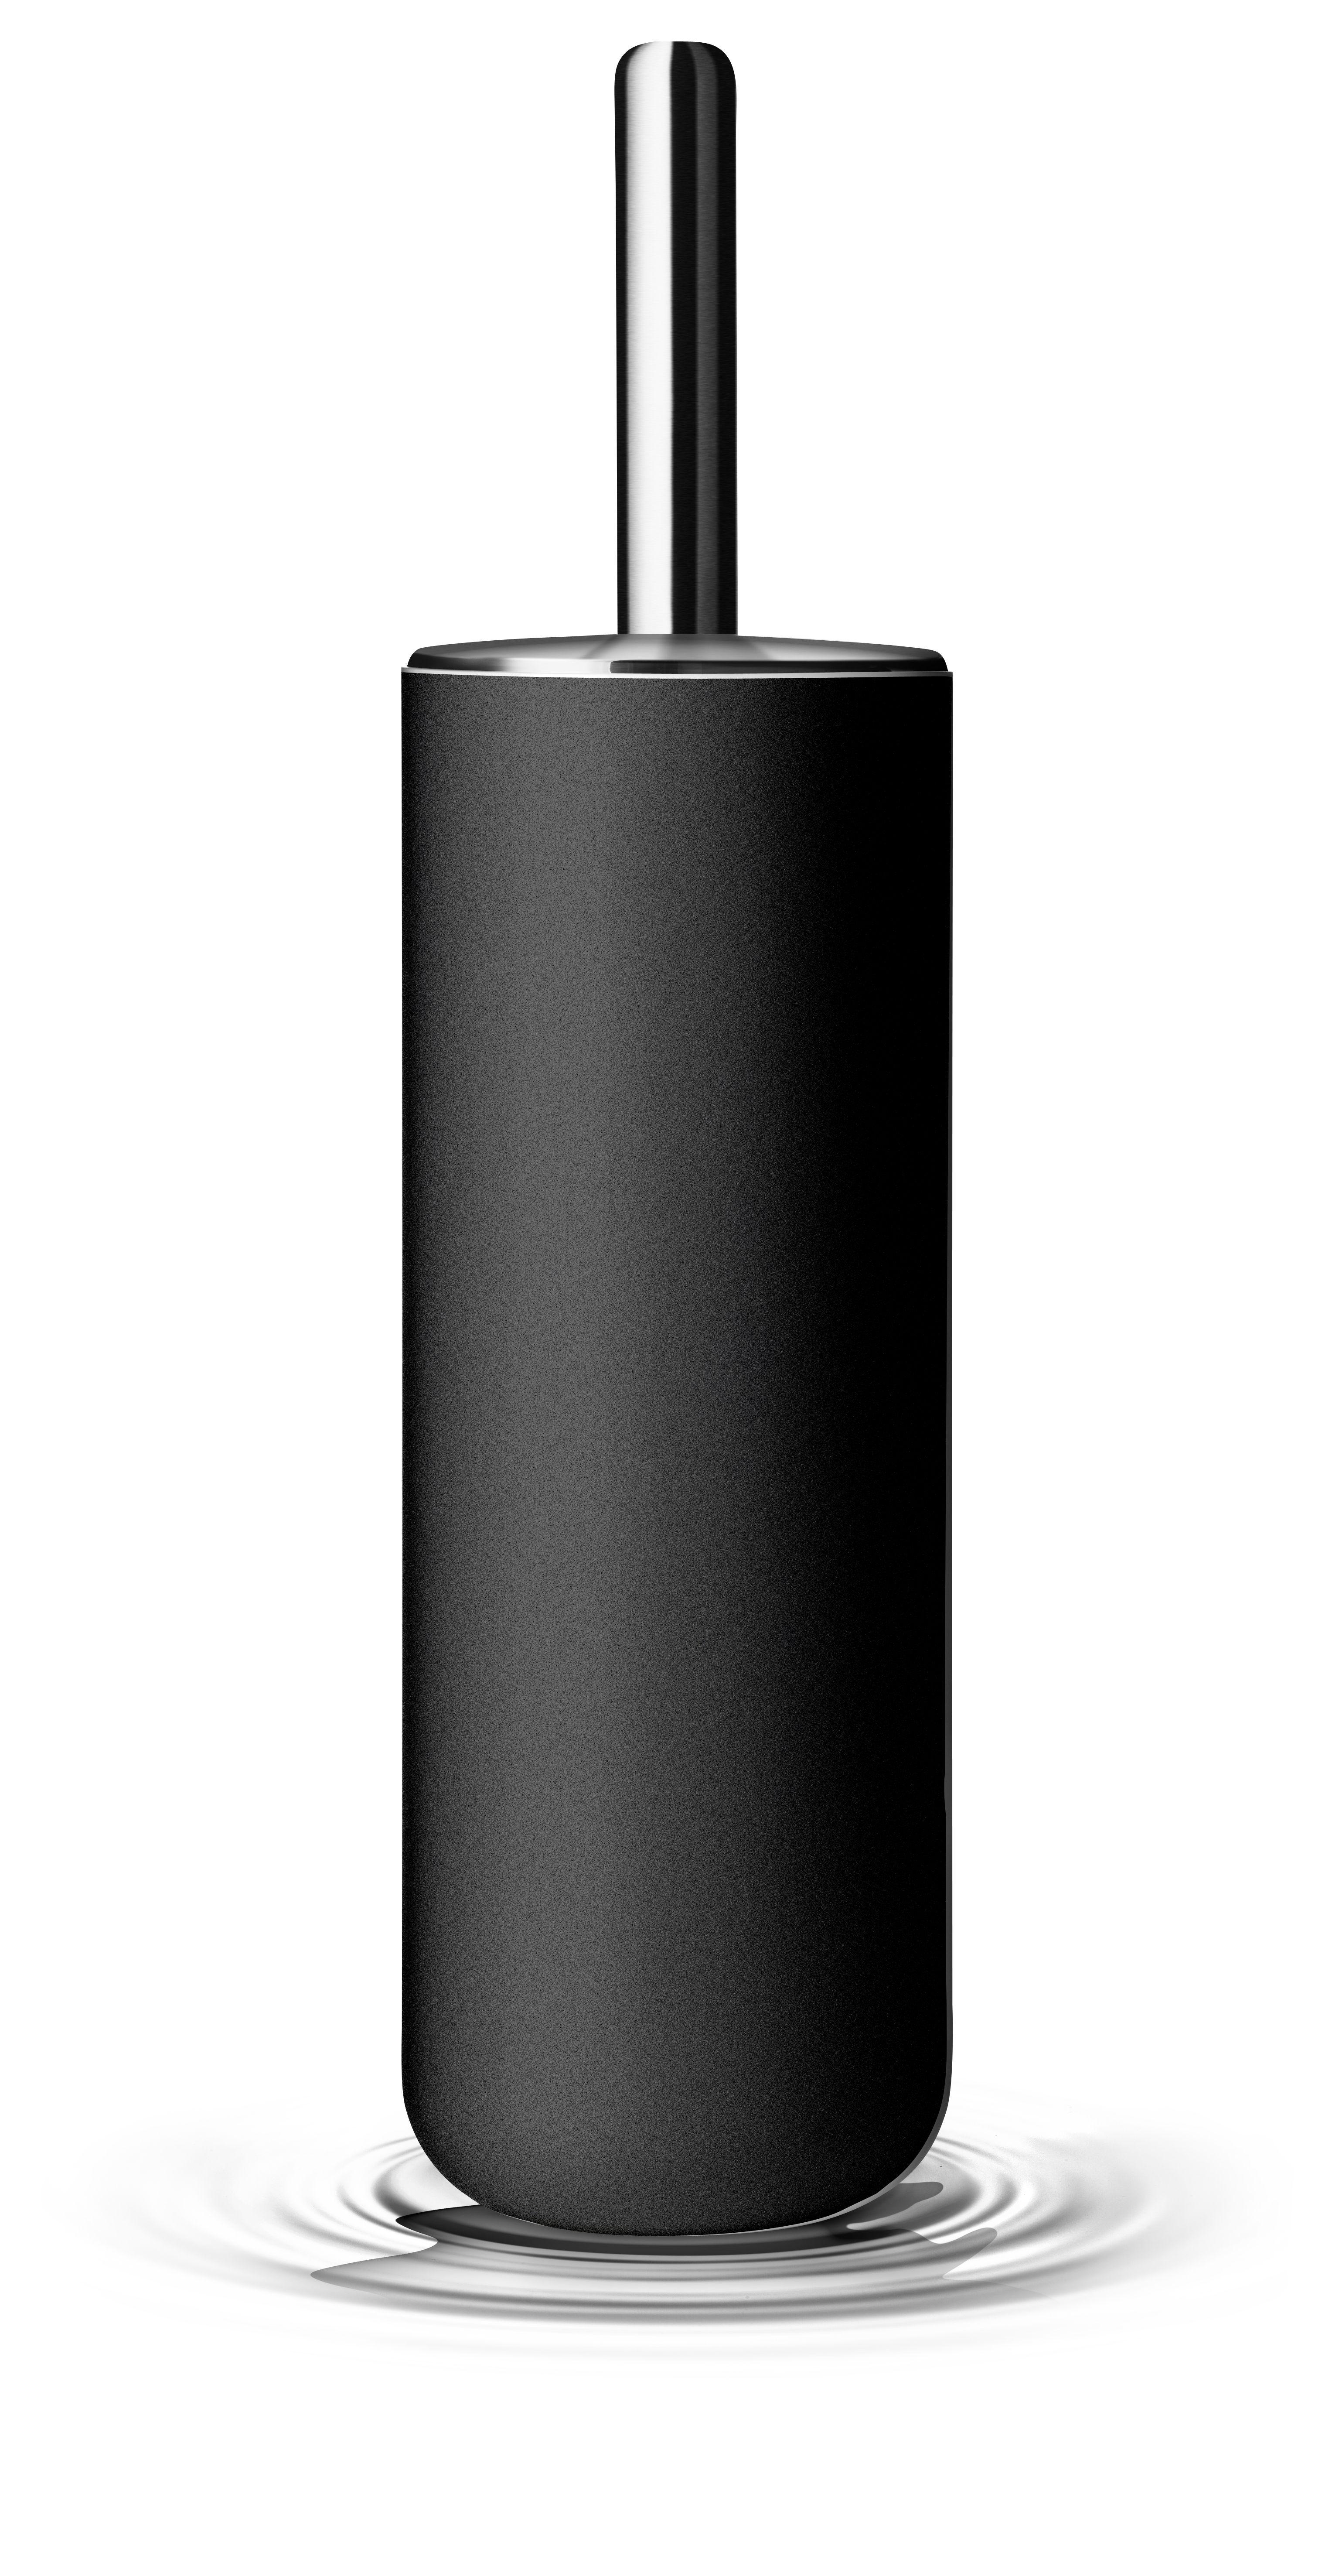 Brosse Toilette Noire brosse wc noir - menu